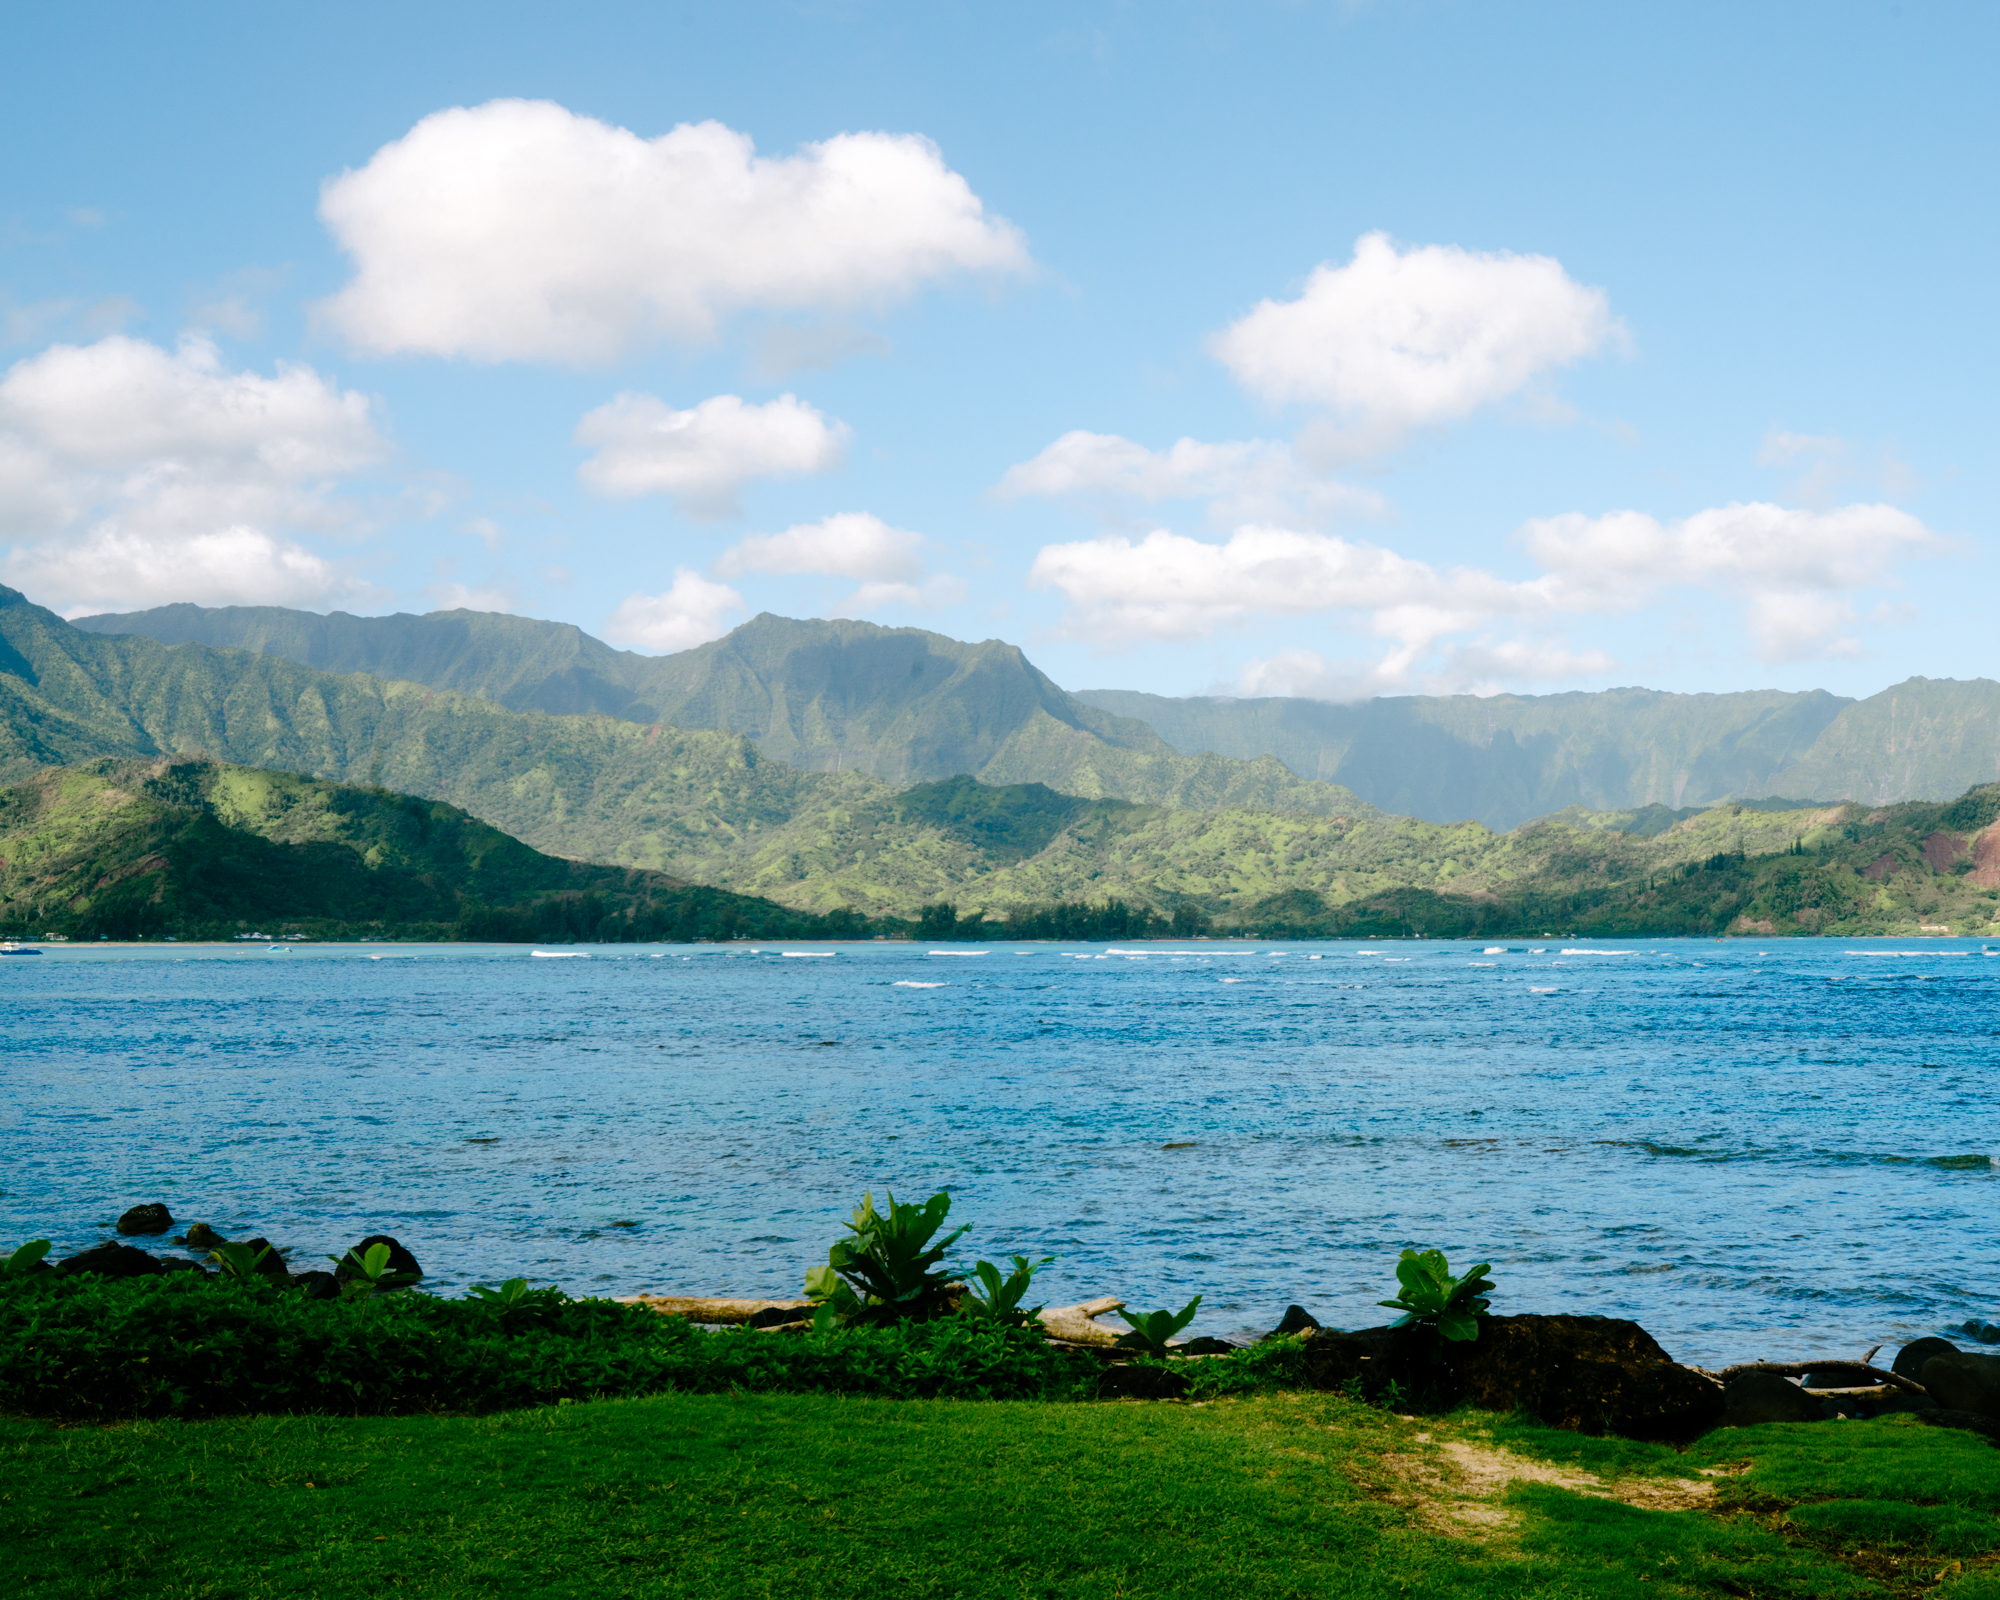 The St Regis Princeville in Kauai has the best view